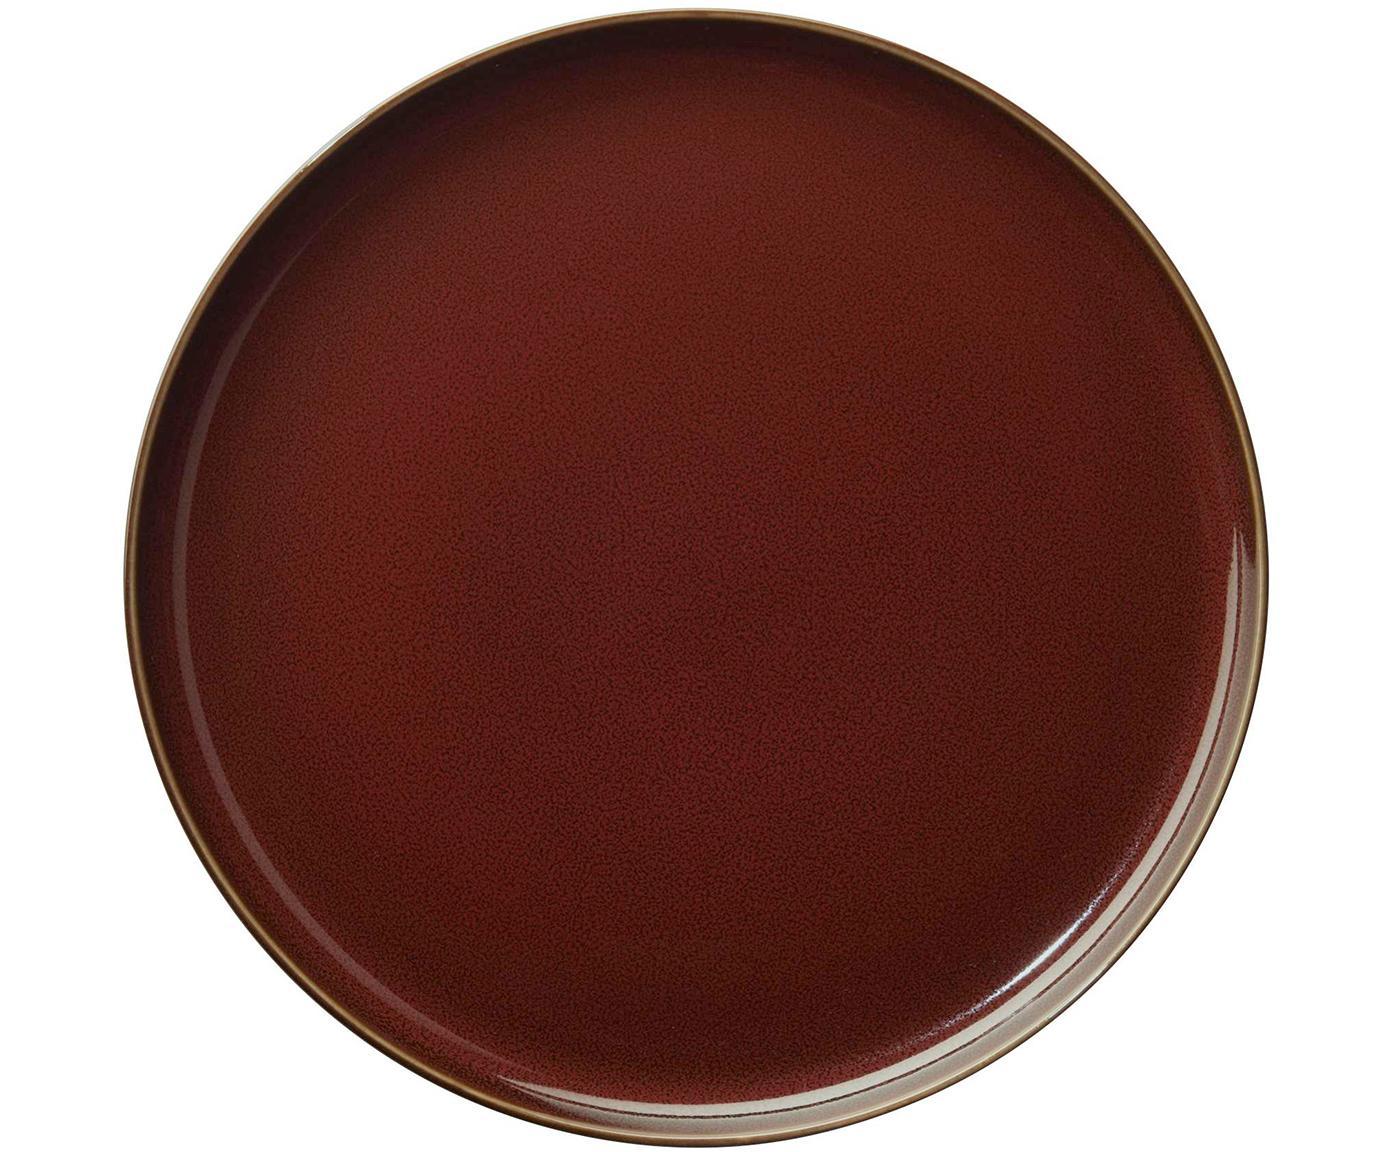 Dinerbord Kolibri, 6 stuks, Porselein, Roodbruin, bruin, Ø 27 cm